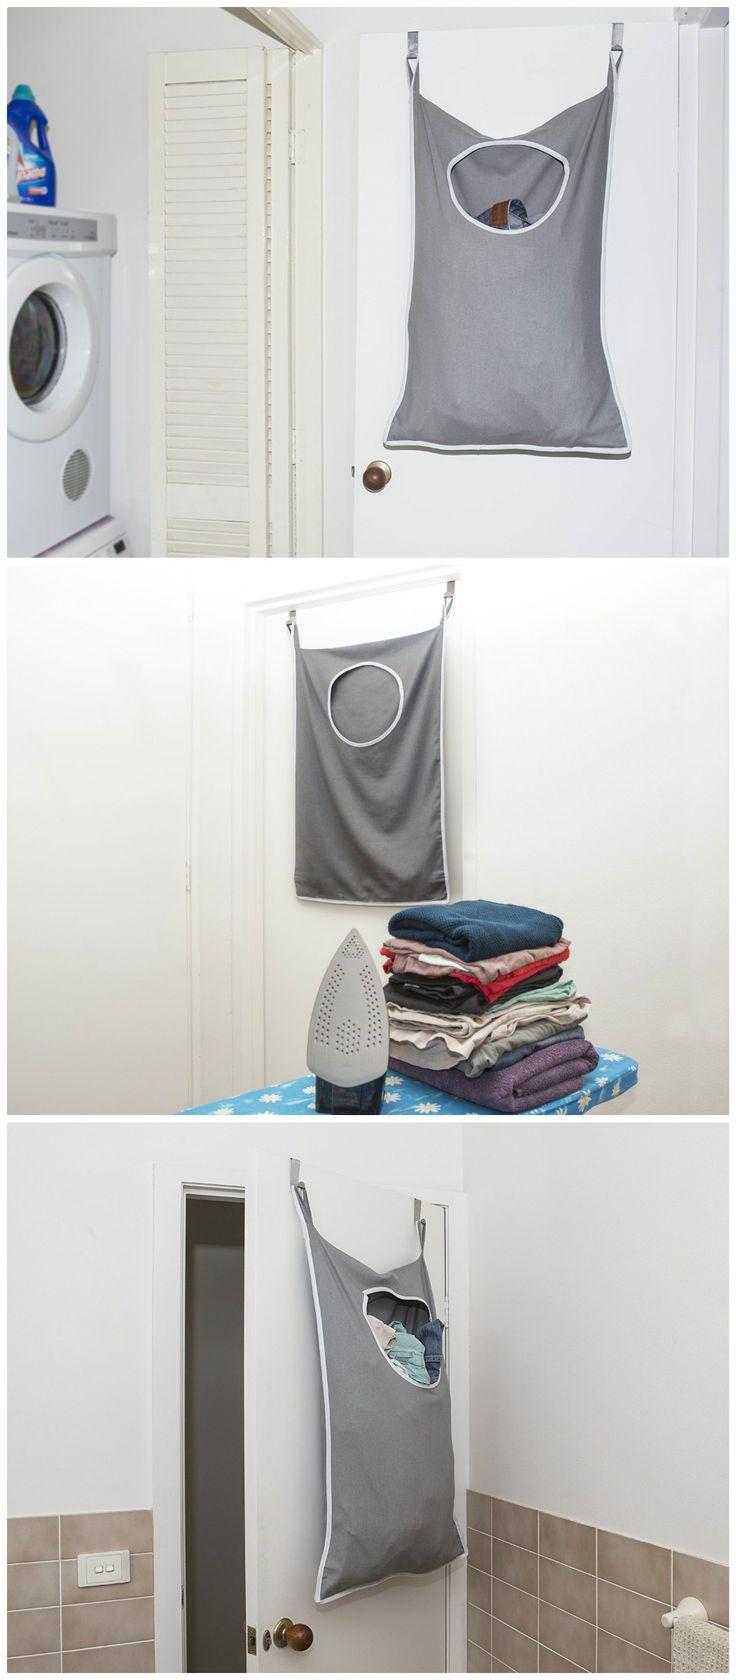 18 space-saving ideas for your bathroom